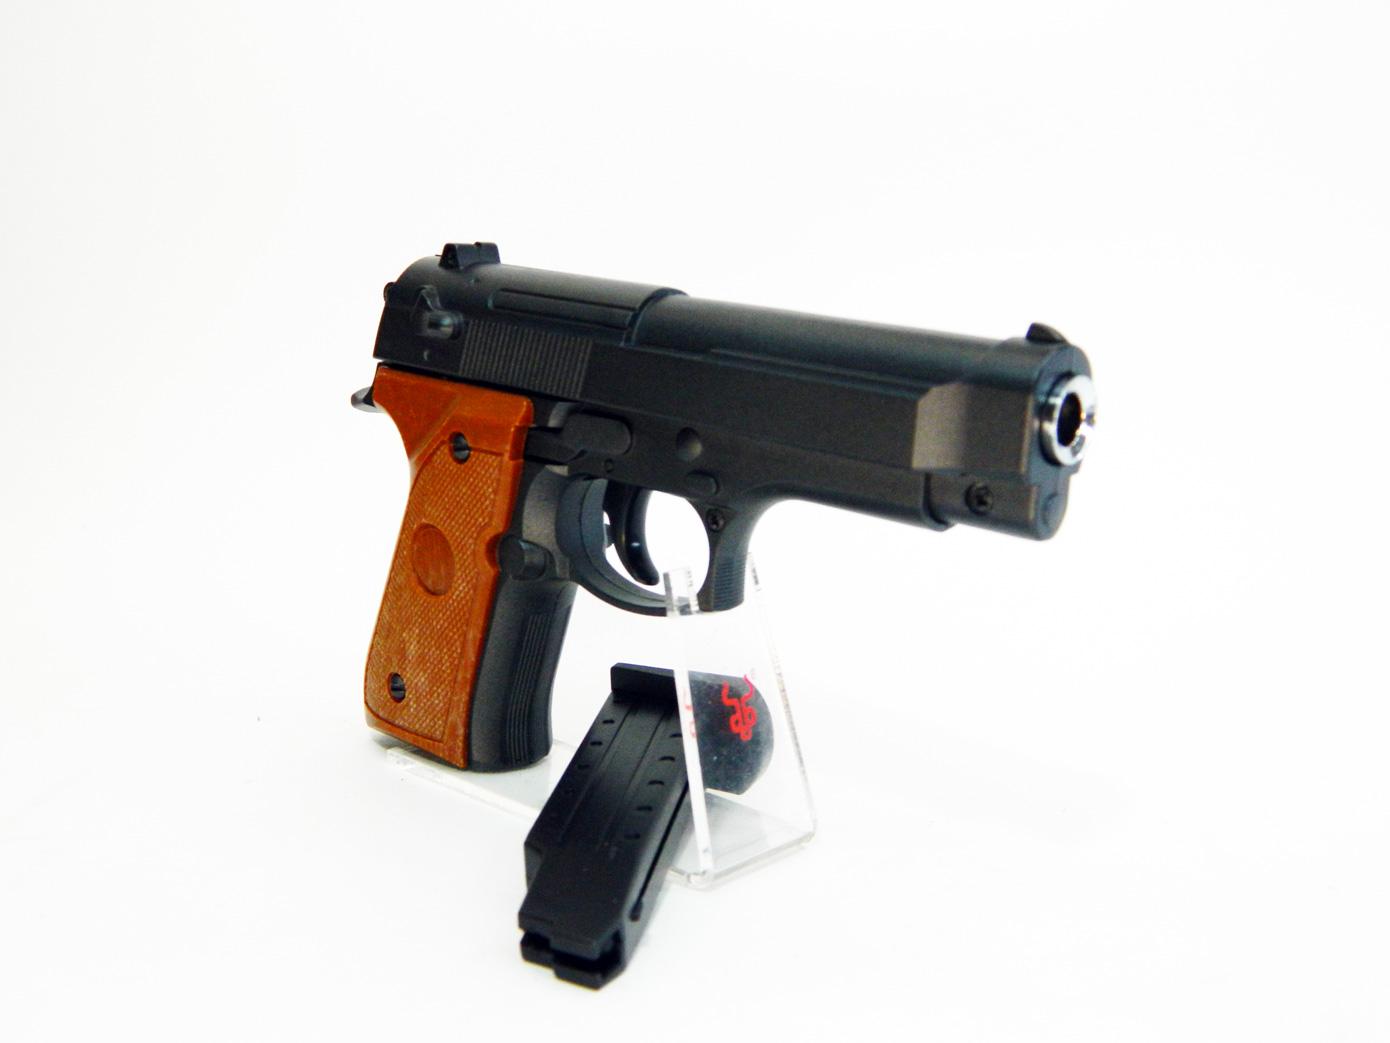 Beretta 92 mini масштаб 1:1 изображение 1